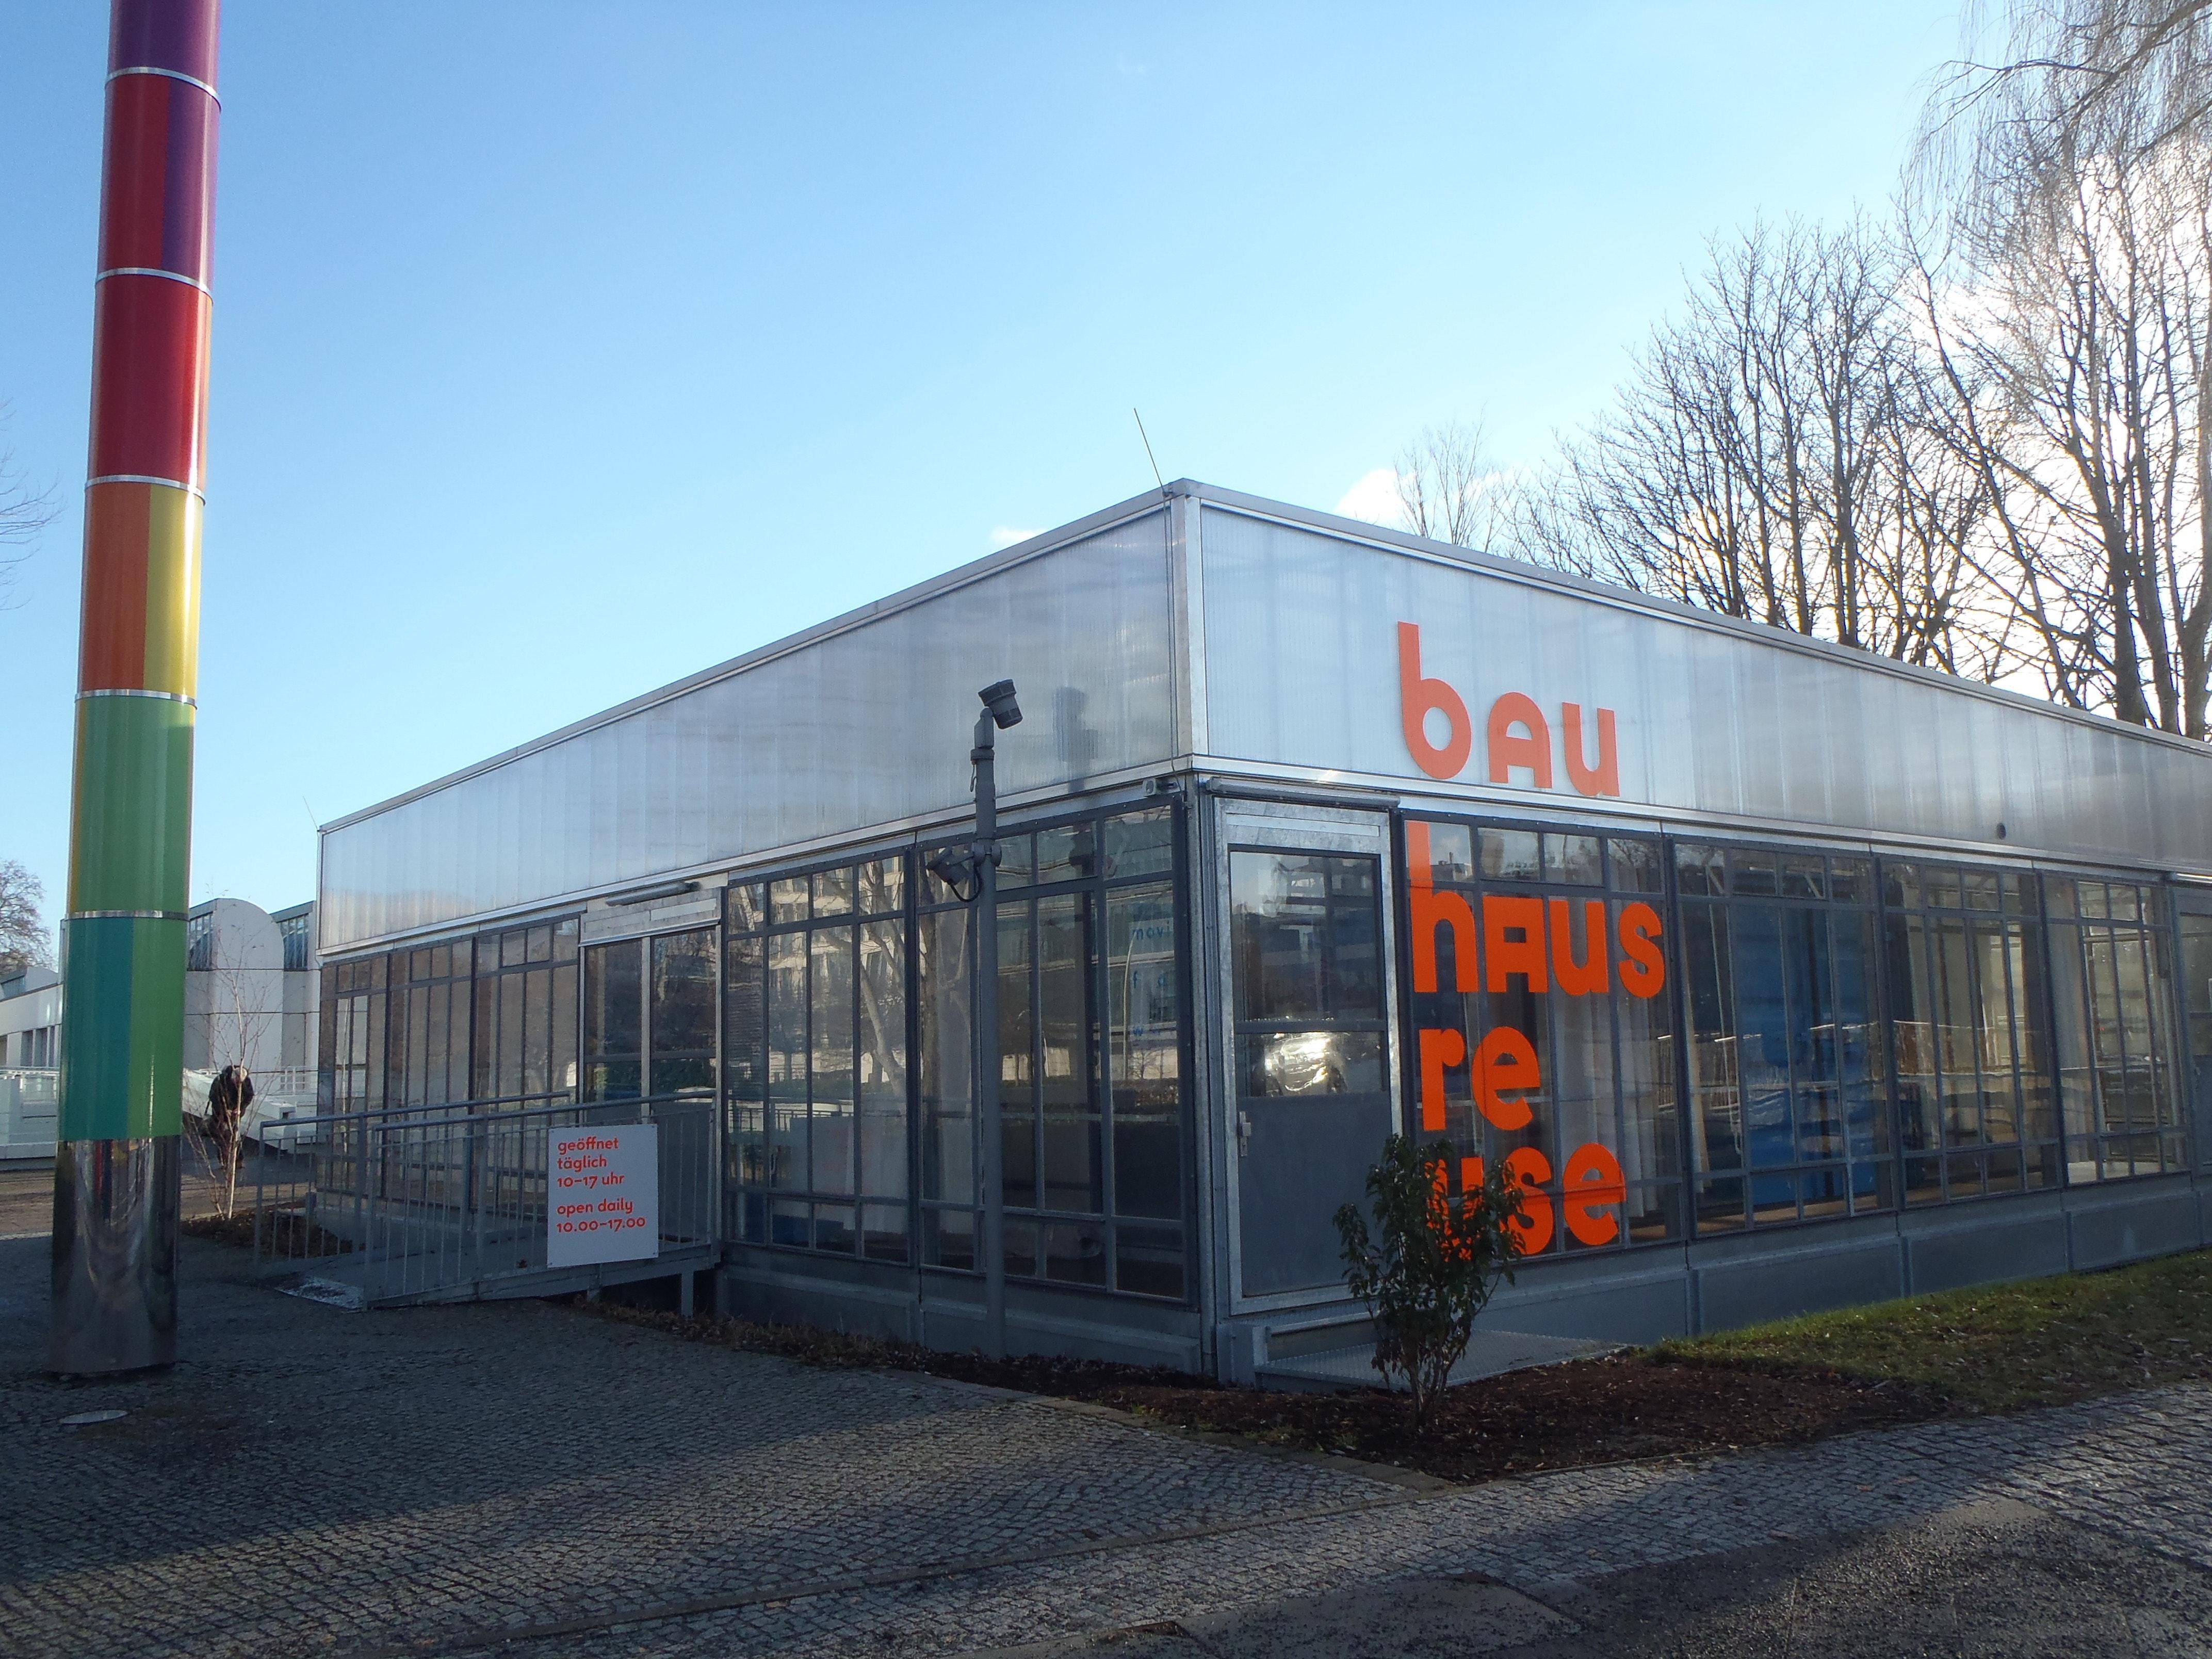 Kostenloses Foto Zum Thema Bauhaus Berlin Museum